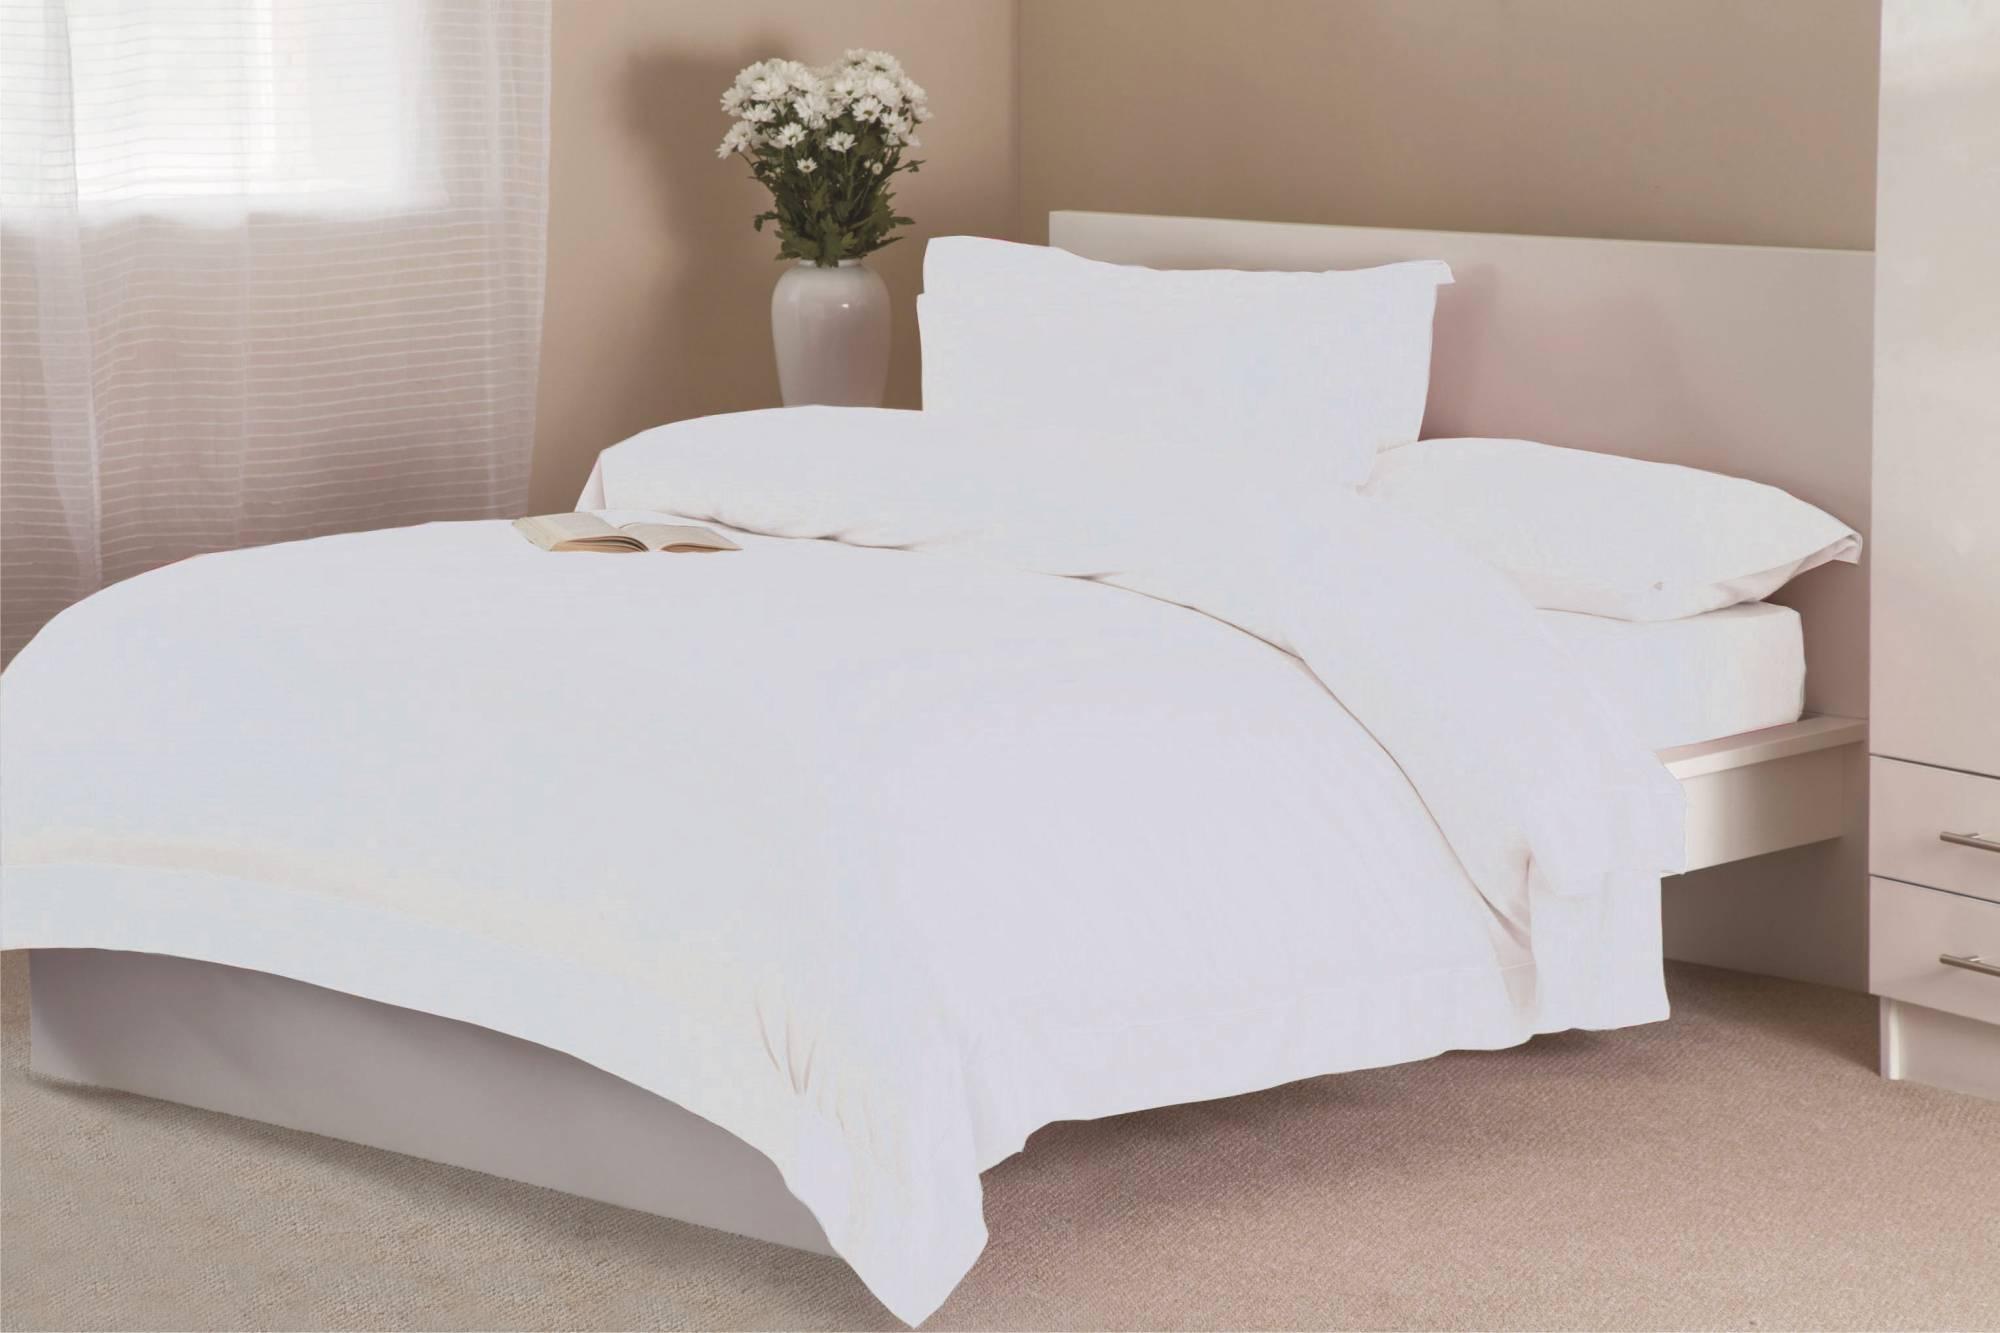 854595a73374 Belledorm Belledorm 400 Count Egyptian Cotton Duvet Cover - White ...